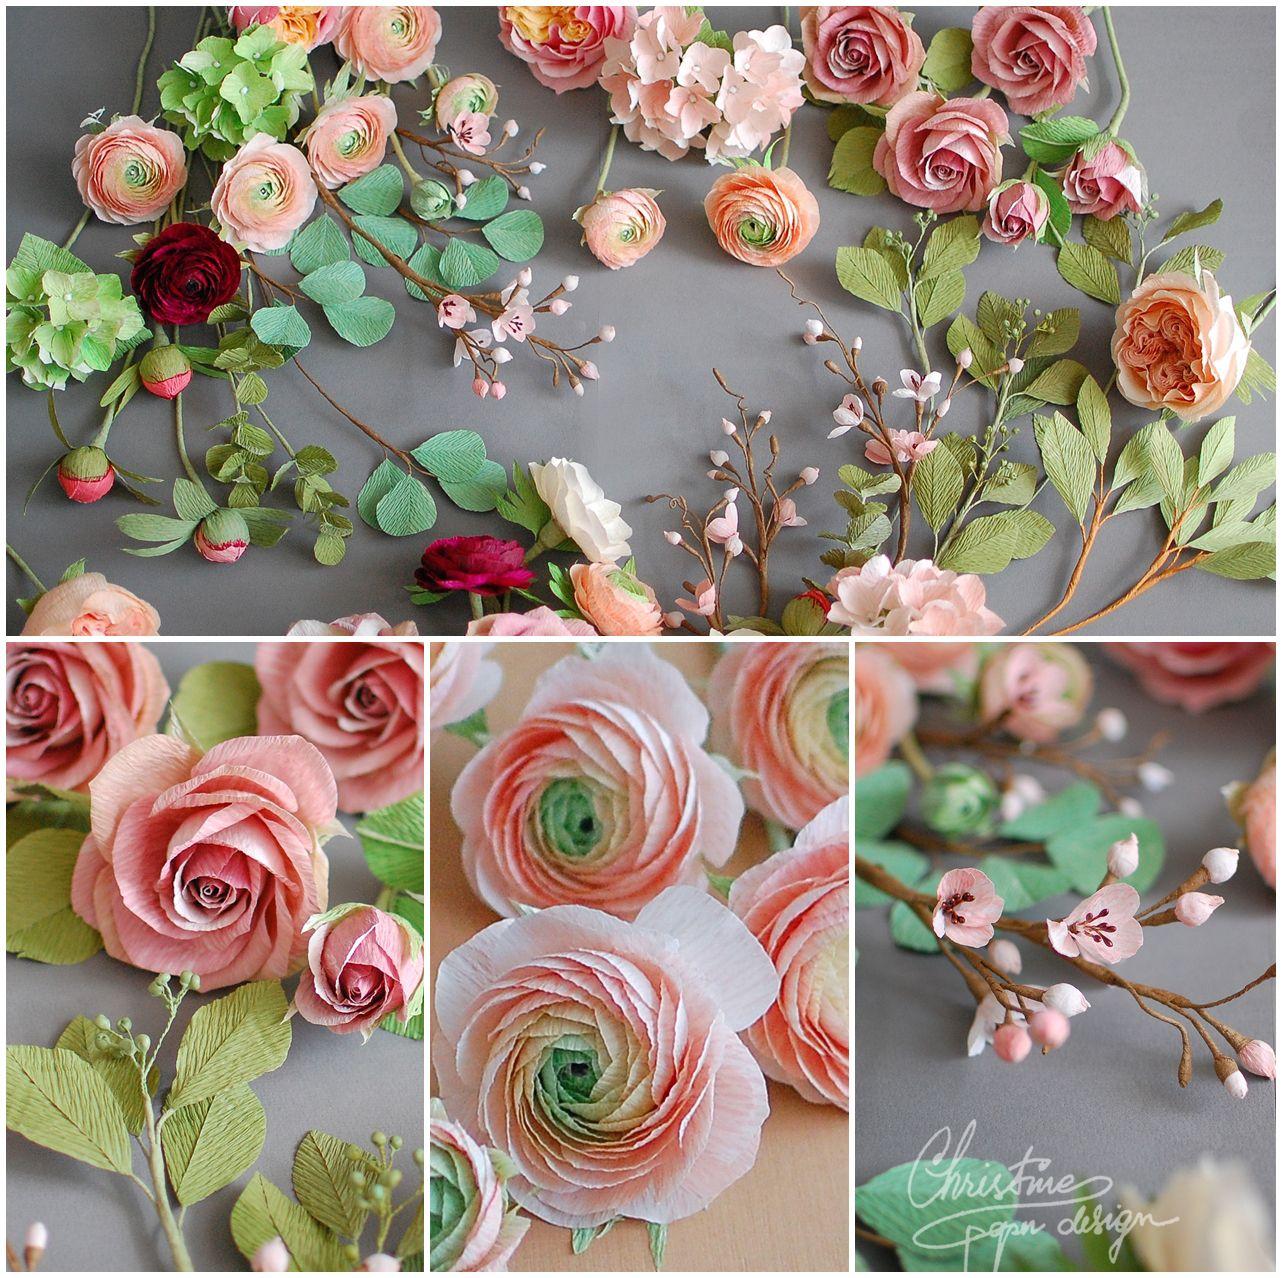 Paper flower bridal bouquet  Christine paper design   business